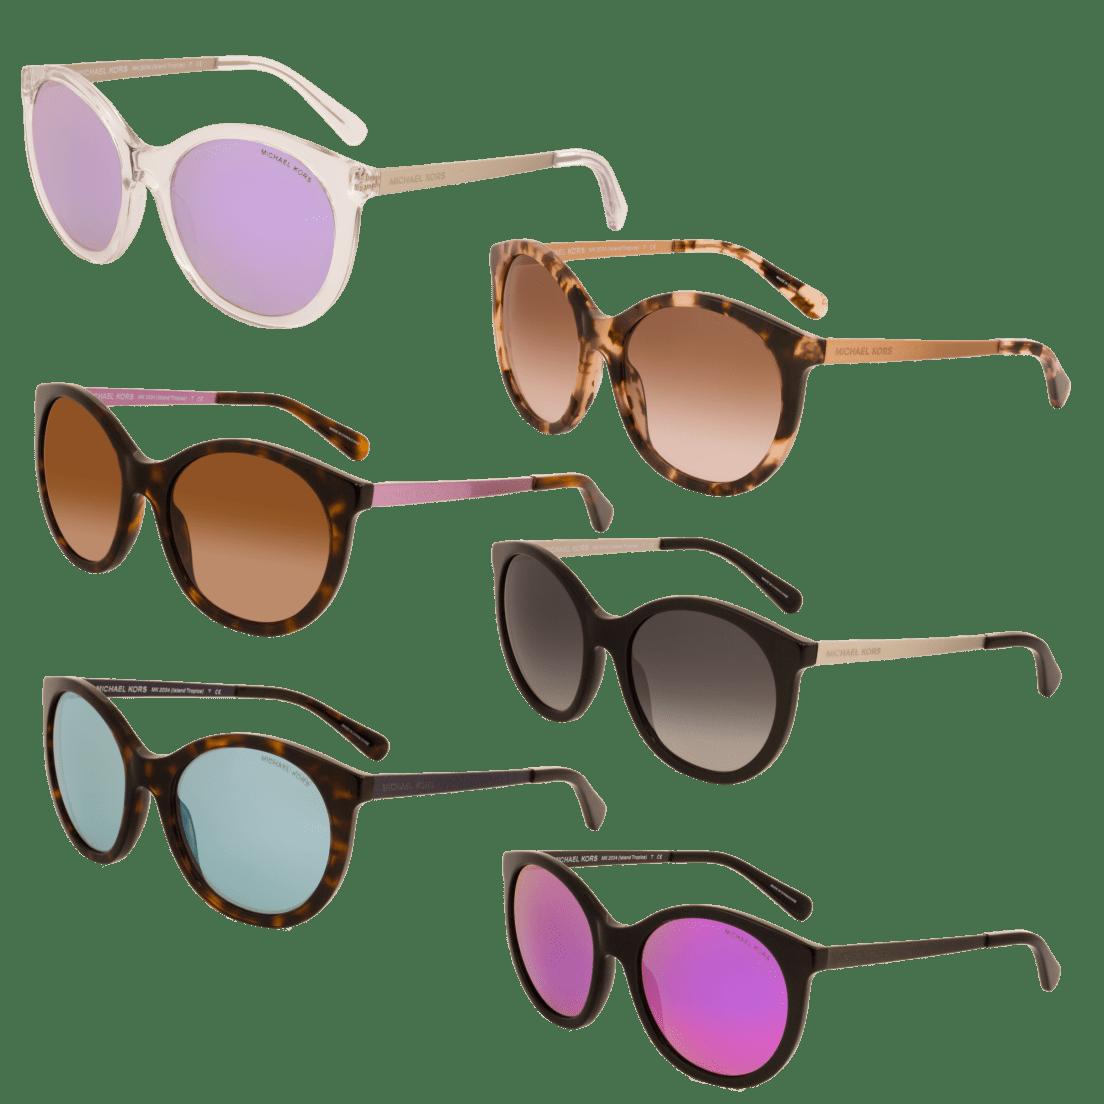 e881af87e61 Michael Kors Island Tropics Sunglasses